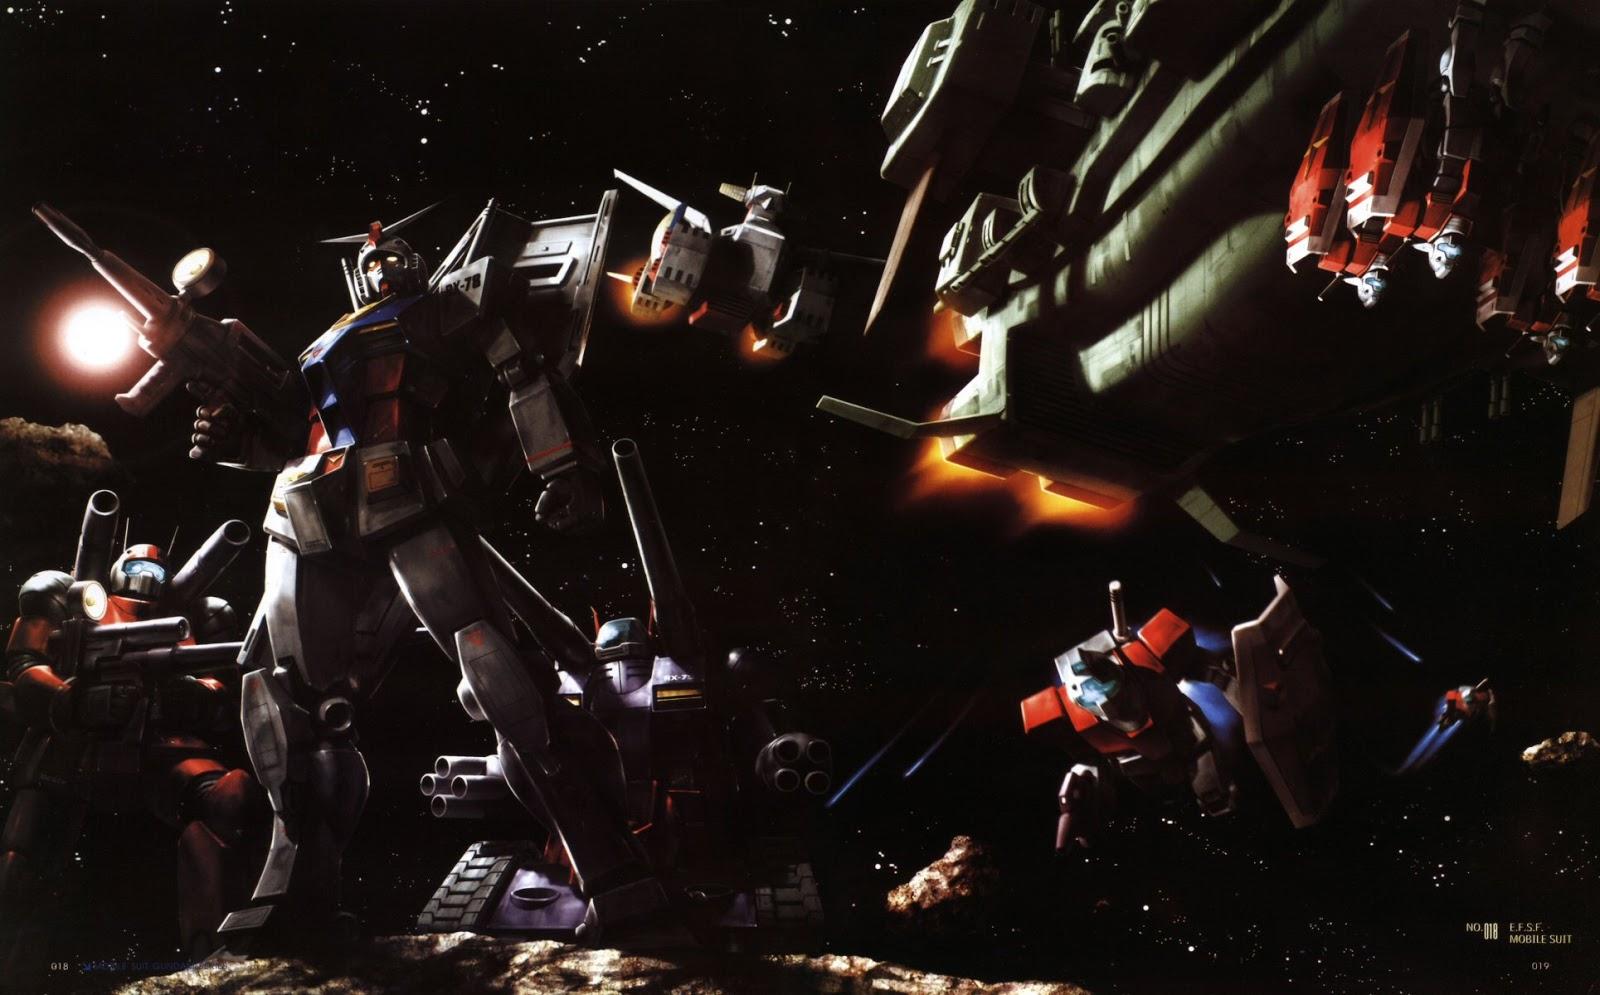 http://1.bp.blogspot.com/-KHWw1cn1czg/UNEEApNy73I/AAAAAAABVcY/YuqdQoN_UUE/s1600/Anime_Gundam_332627.jpg